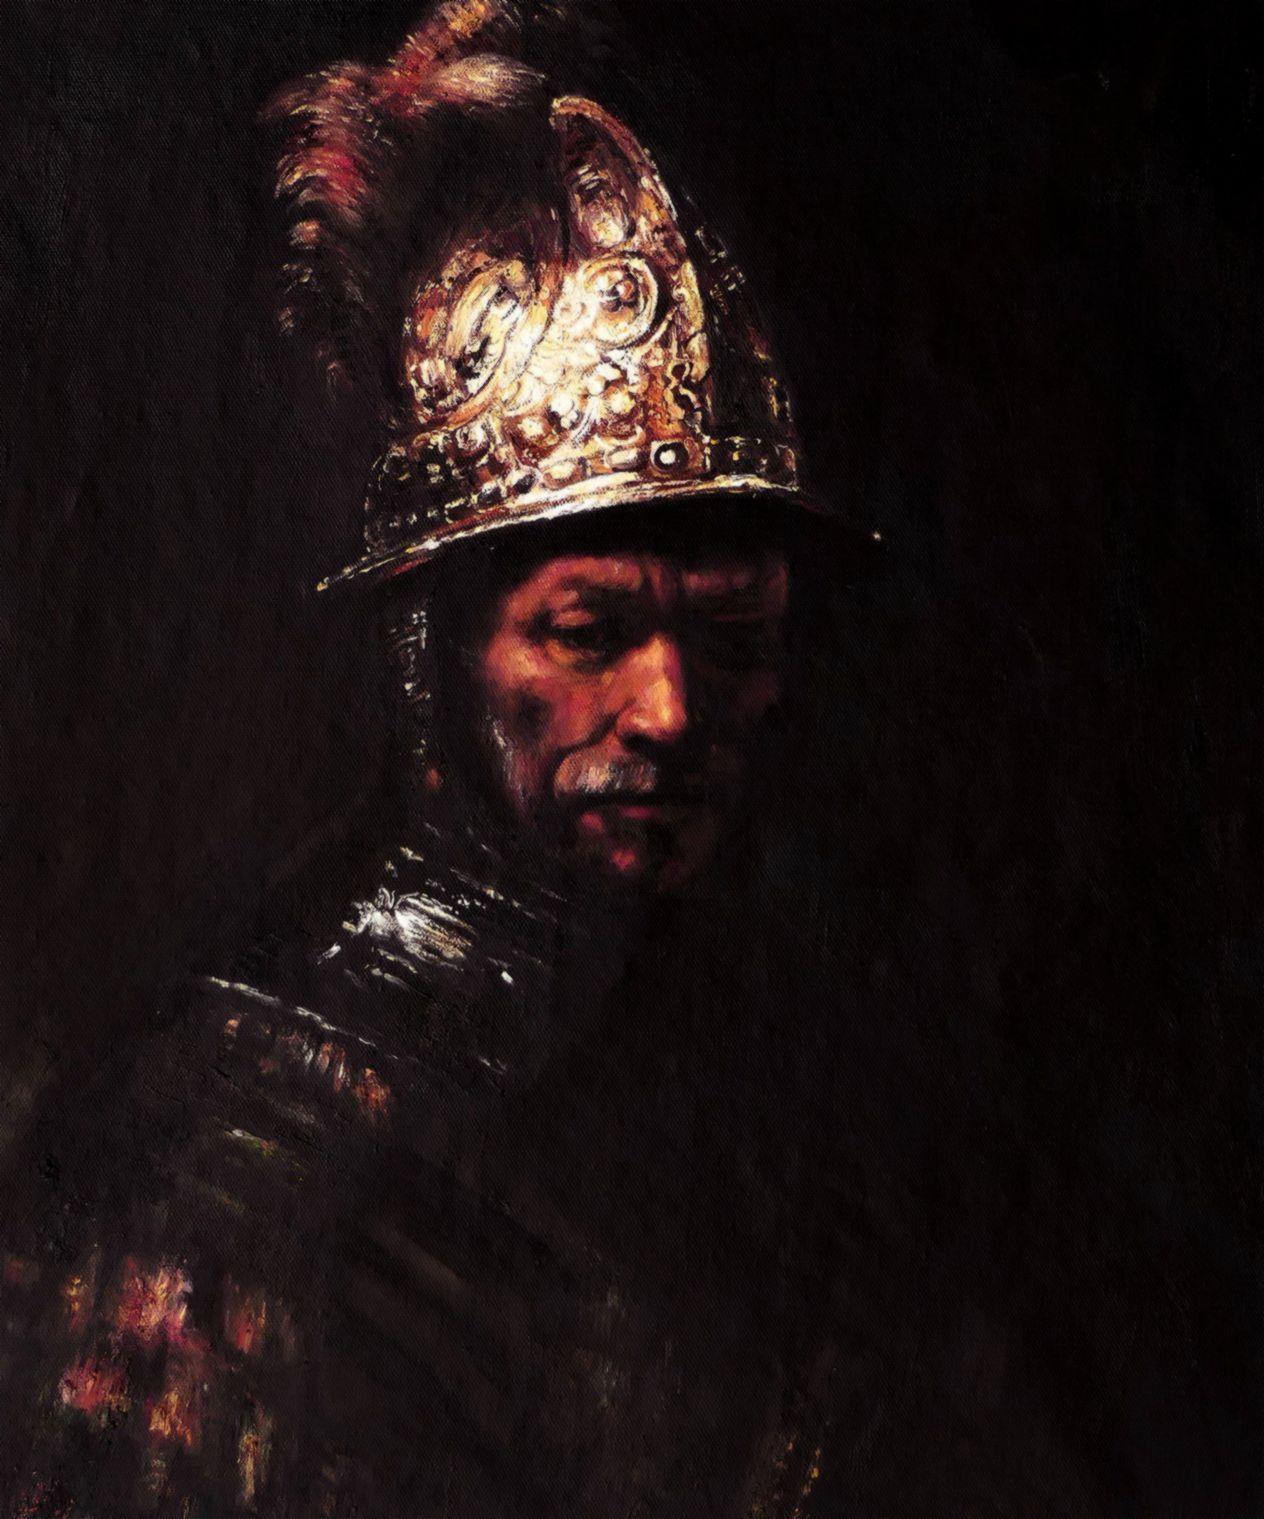 Rembrandt - Mann mit Goldhelm c97216 50x60cm edles Ölgemälde handgemalt Museumsqualität